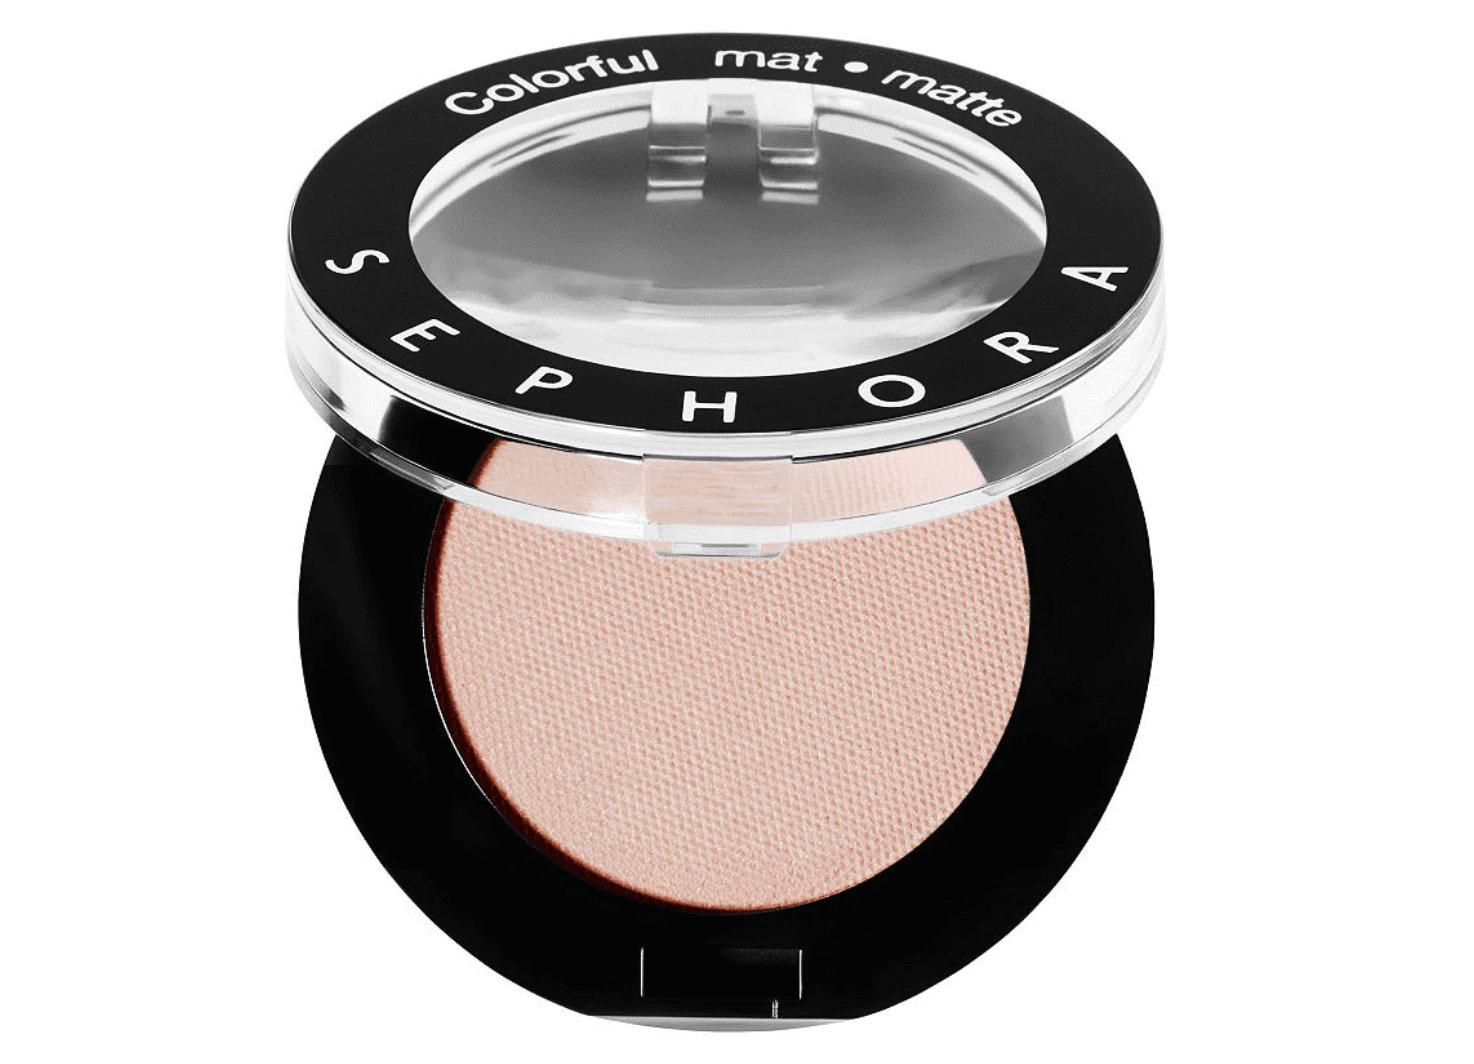 Sephora Colorful Eyeshadow Secret Boudoir 206